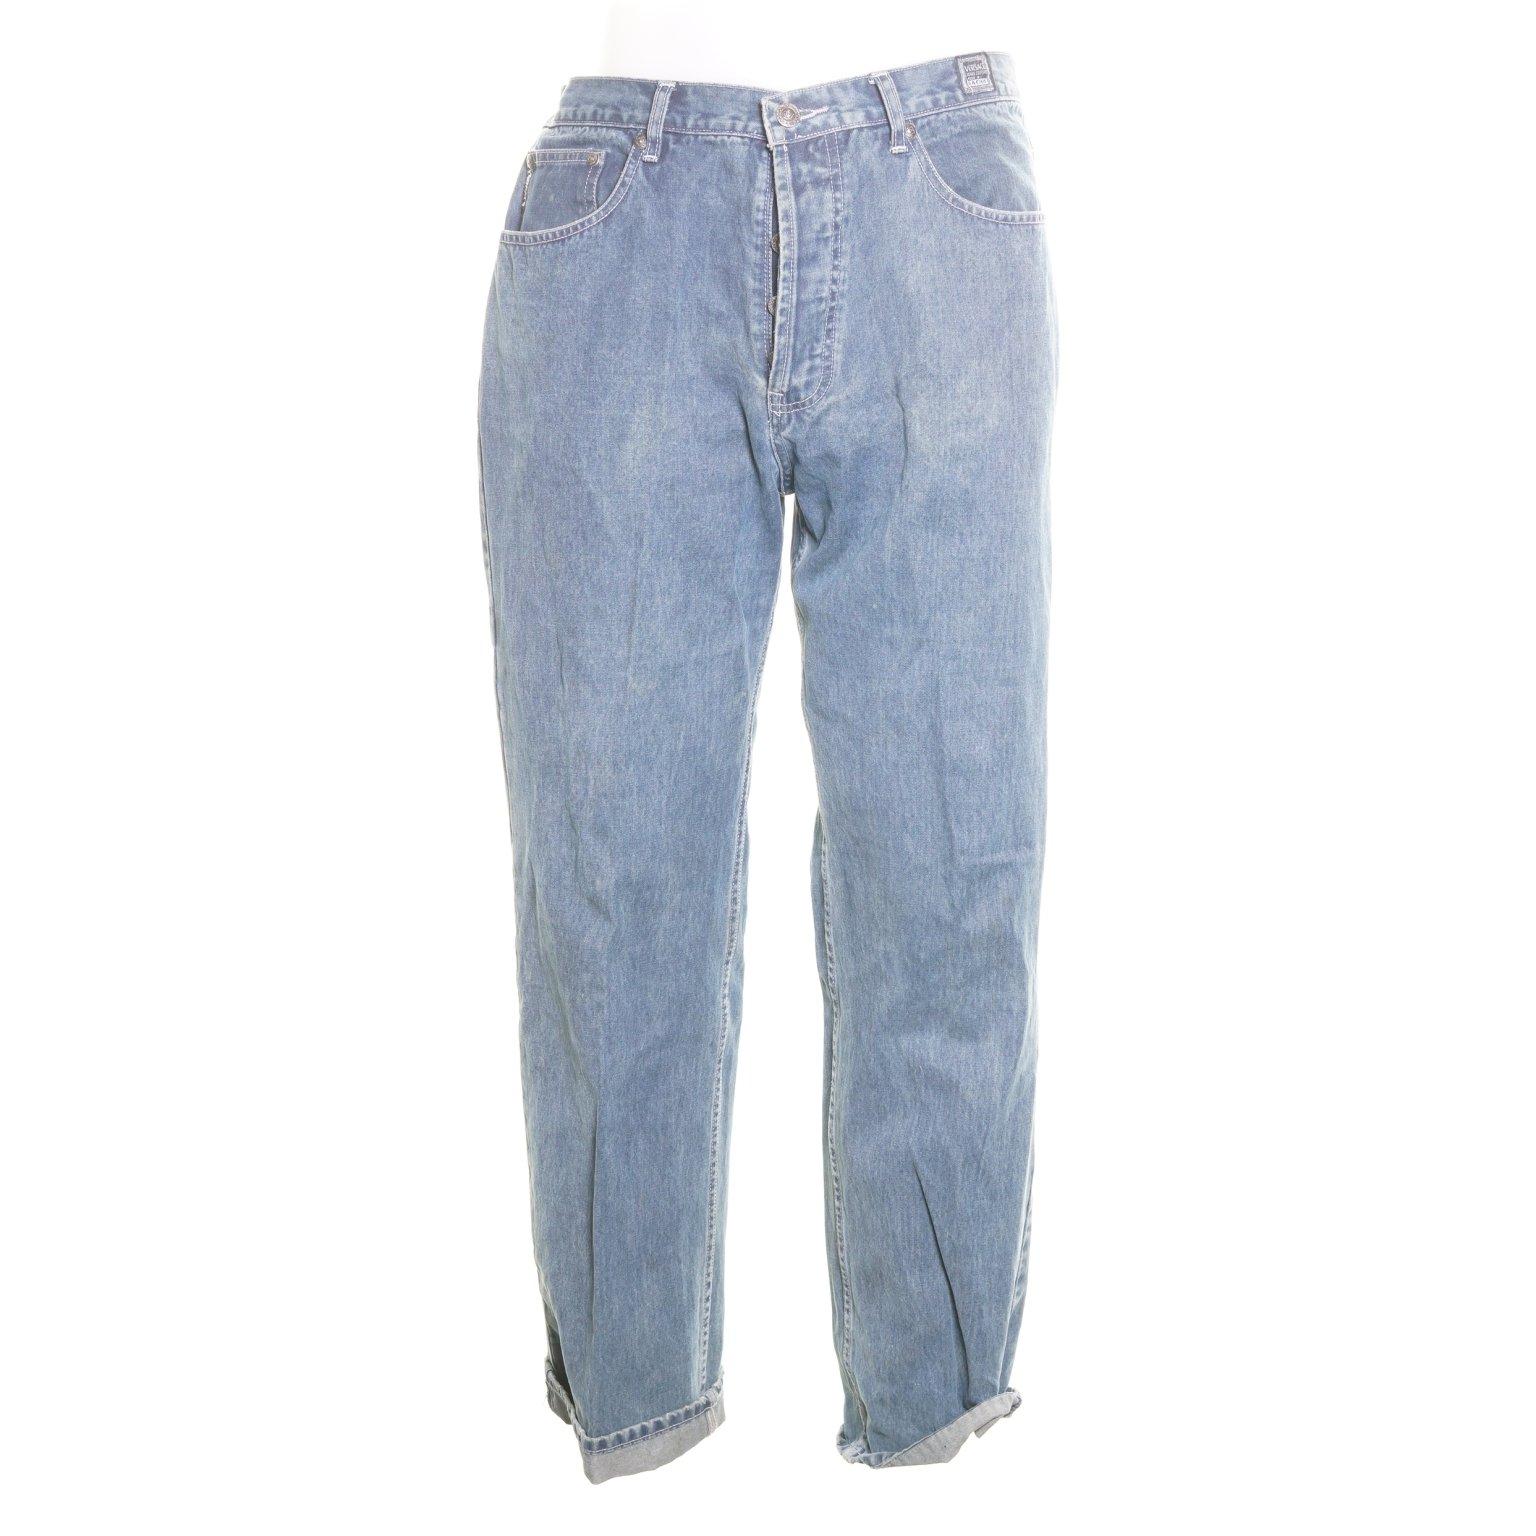 fc02d8250c5 Versace, Jeans, Strl: 38, Blå (354344402) ᐈ Sellpy på Tradera